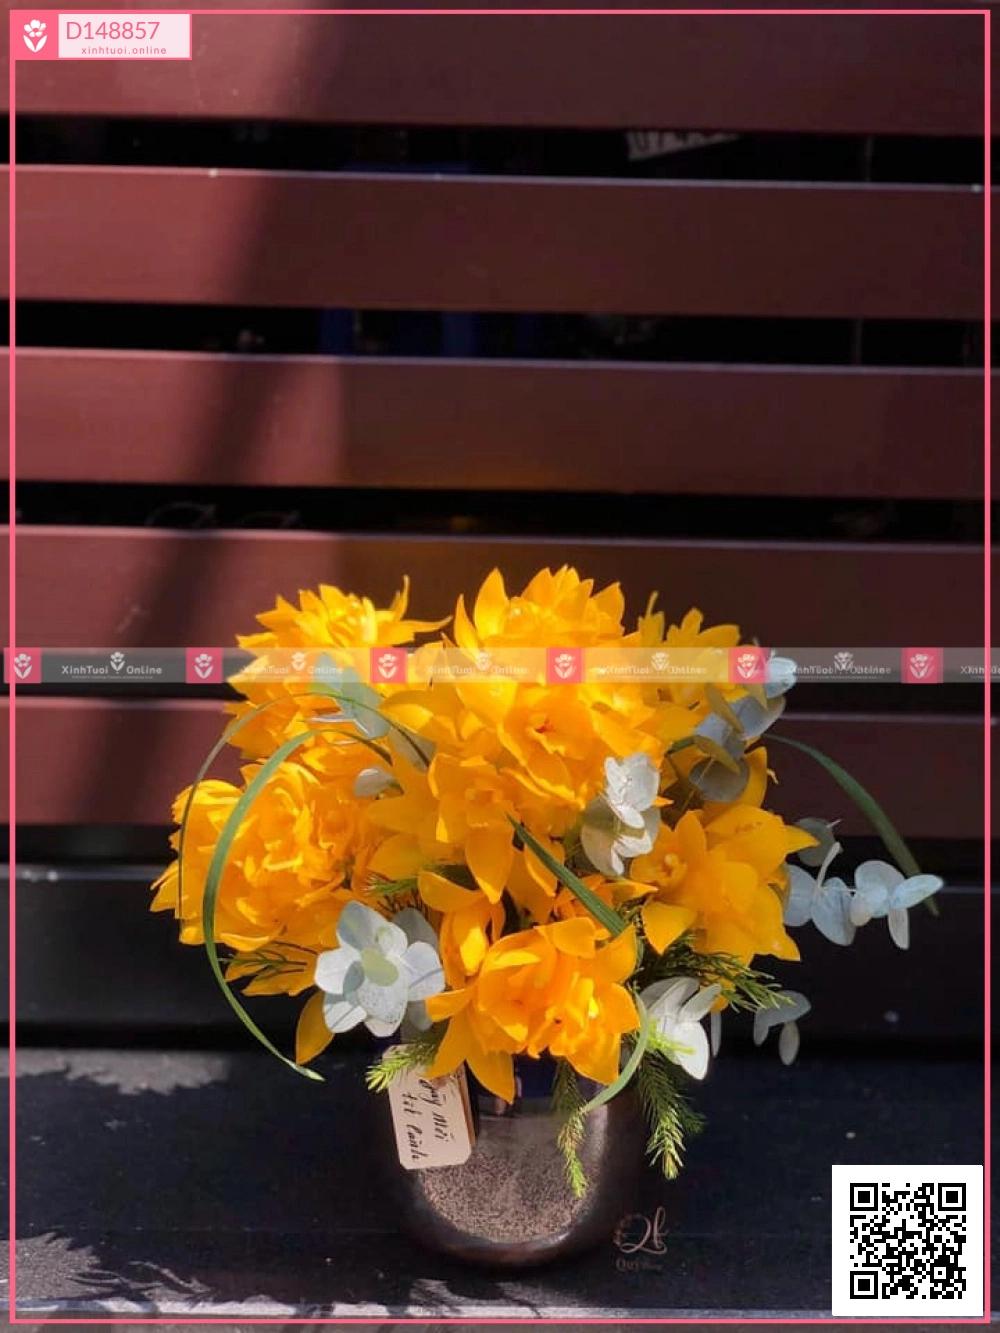 Mùa yêu - D148857 - xinhtuoi.online